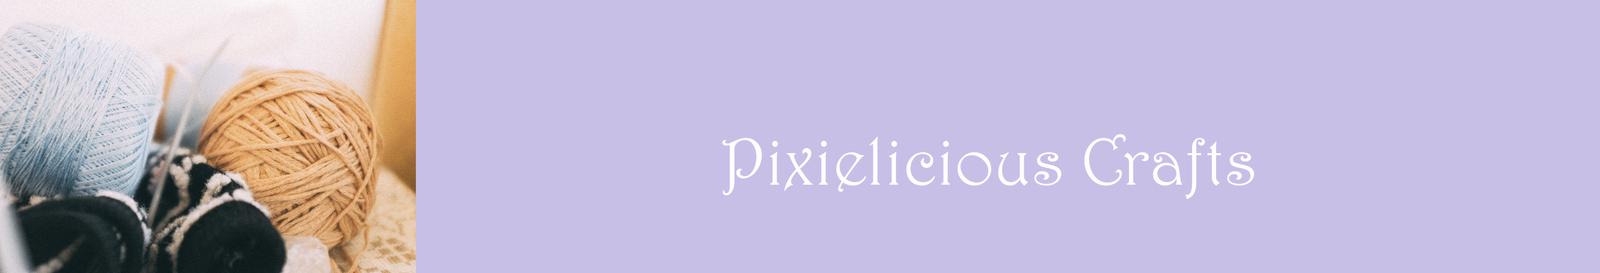 Pixielicious Crafts